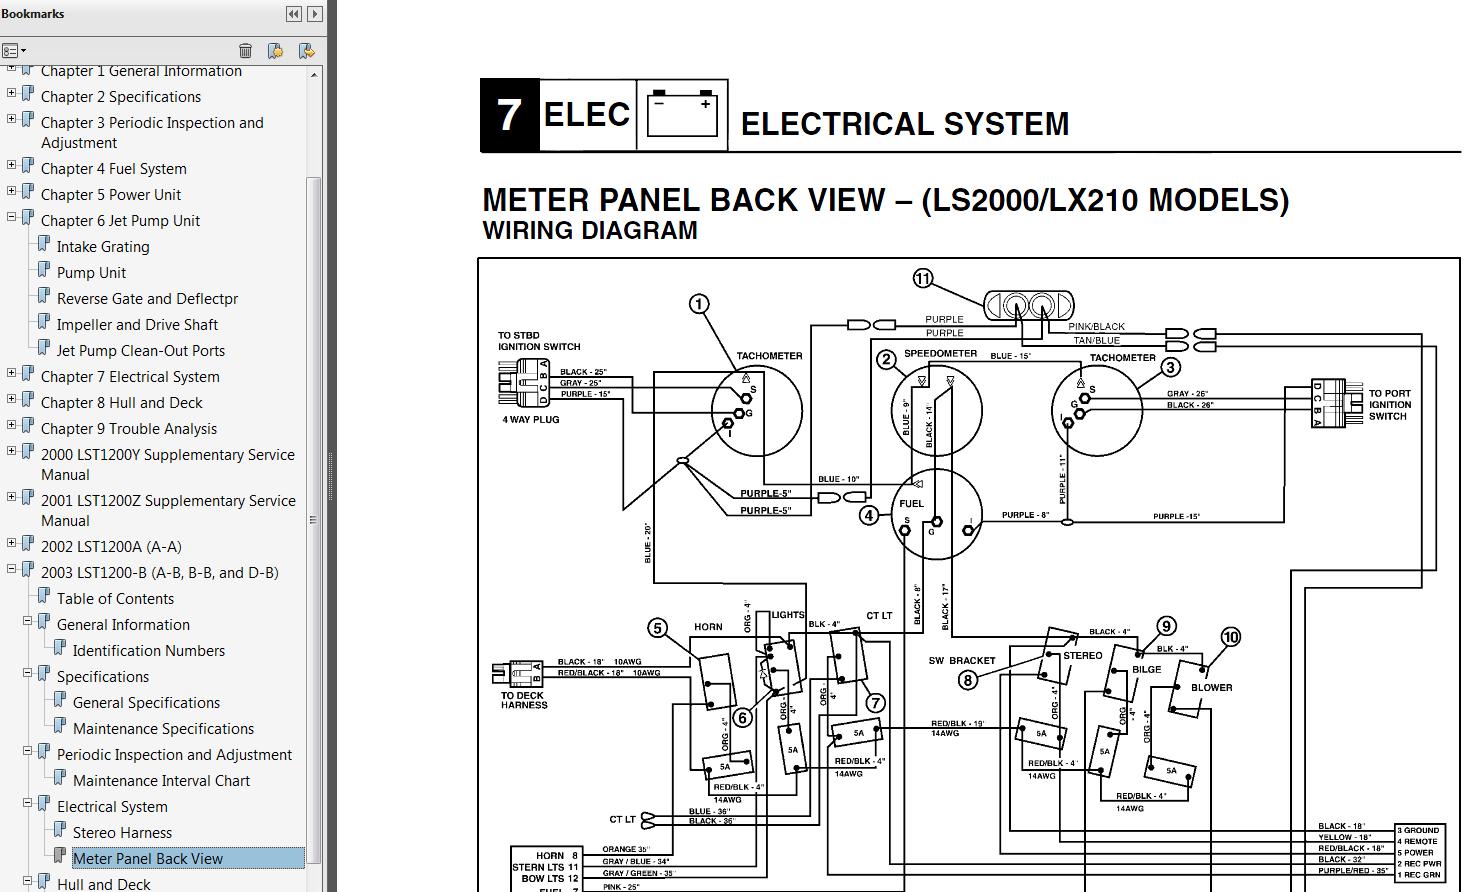 diagram of boat wiring diagram - millions ideas diagram and, Wiring diagram